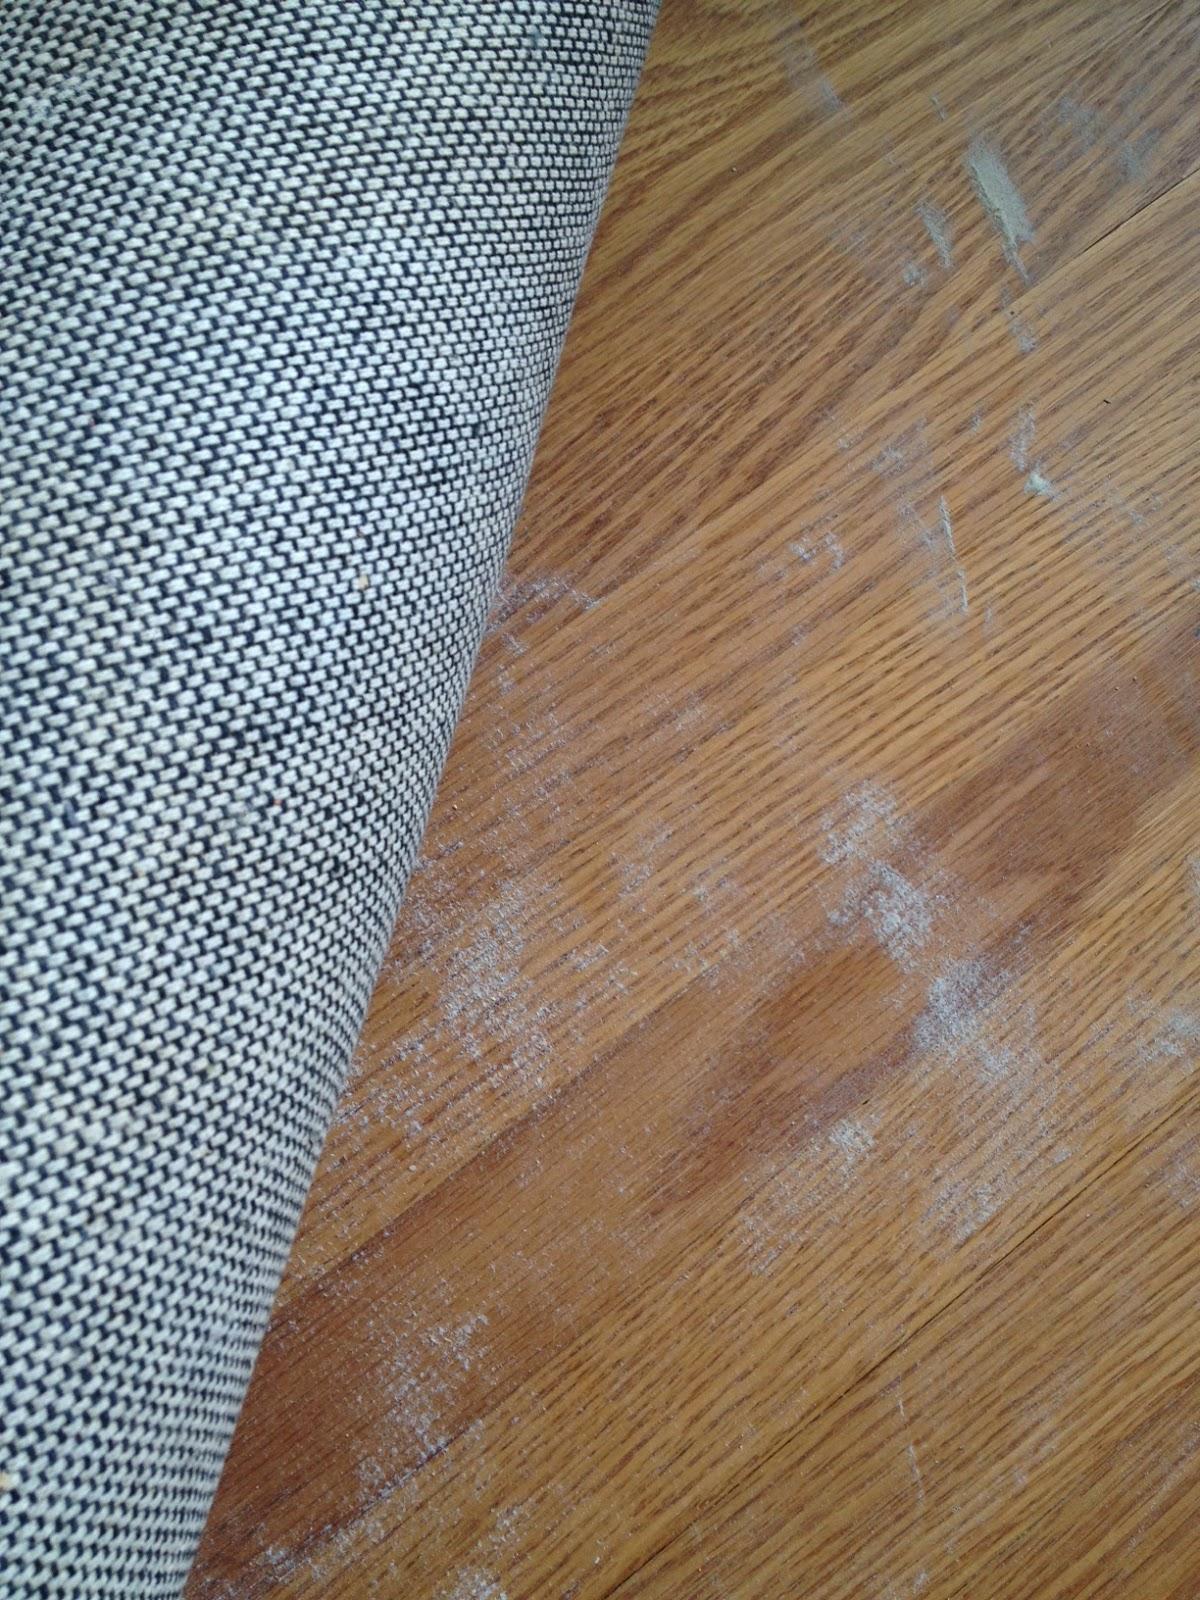 What S The White Powder Under My Rug